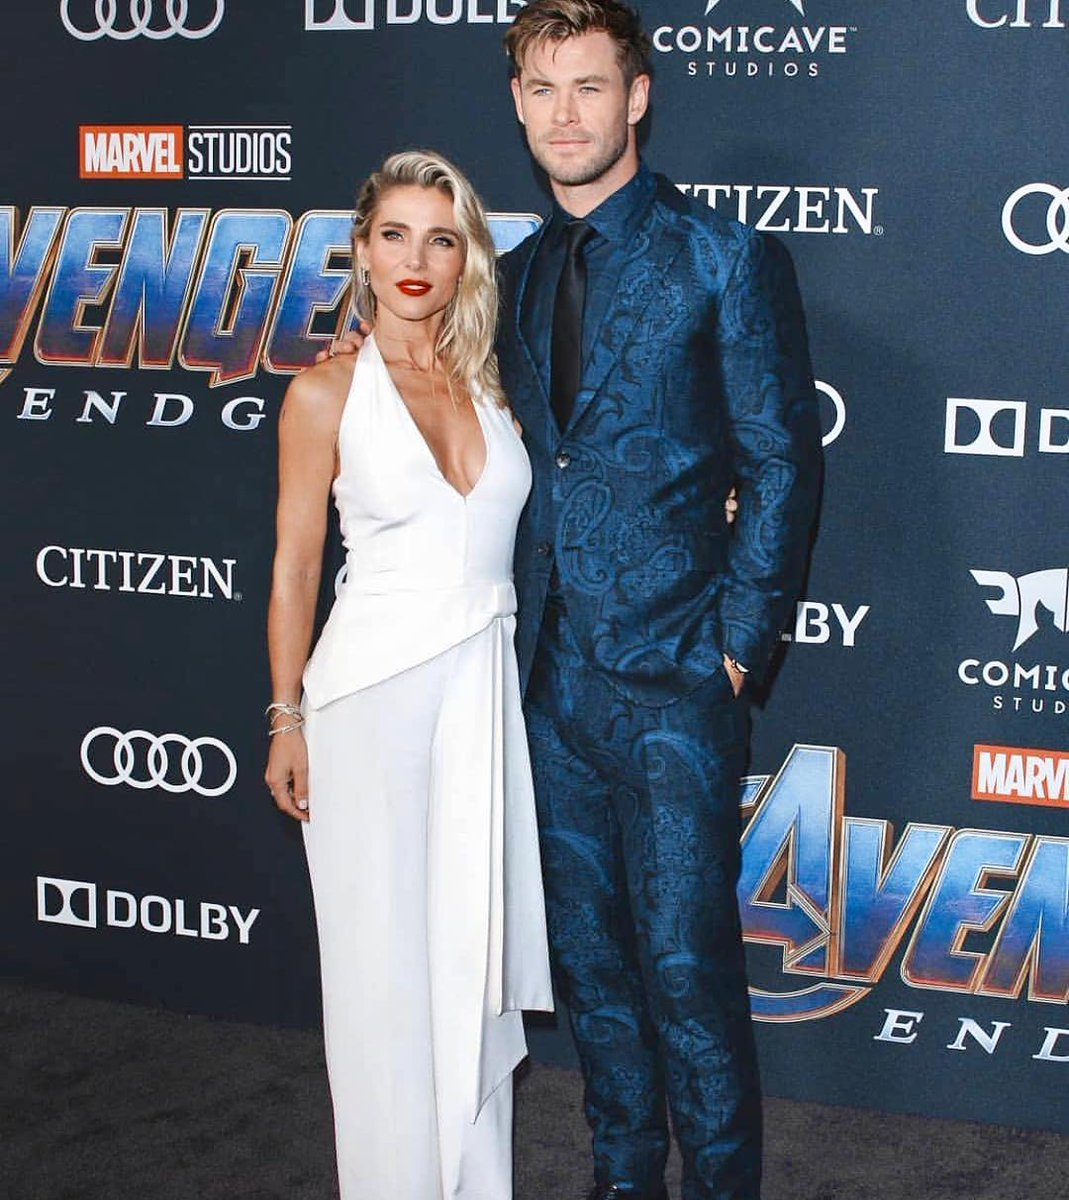 Avengers world premiere last night. This movie's gonna blow ya socks off 🧦💣🤙🤙🤙🕺🏻 #avengersendgame #MarvelStudios